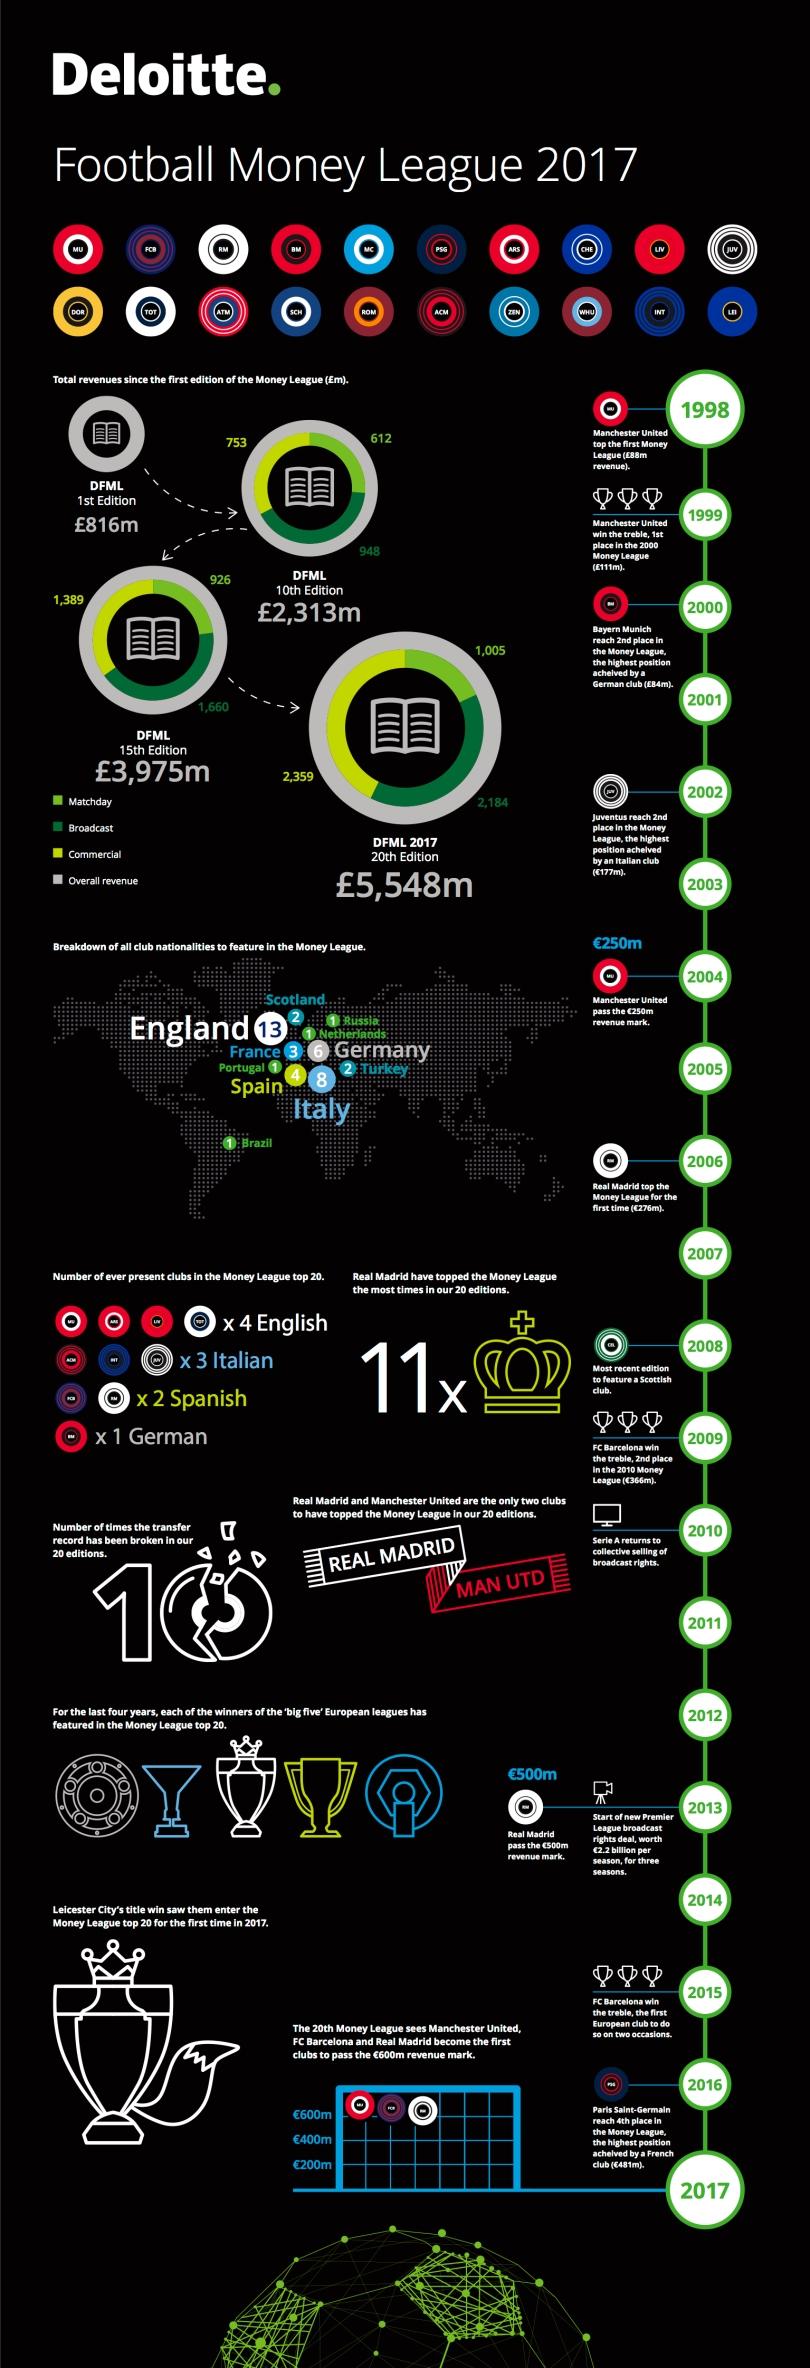 deloitte-uk-sport-football-money-league-2017-infographic.jpg